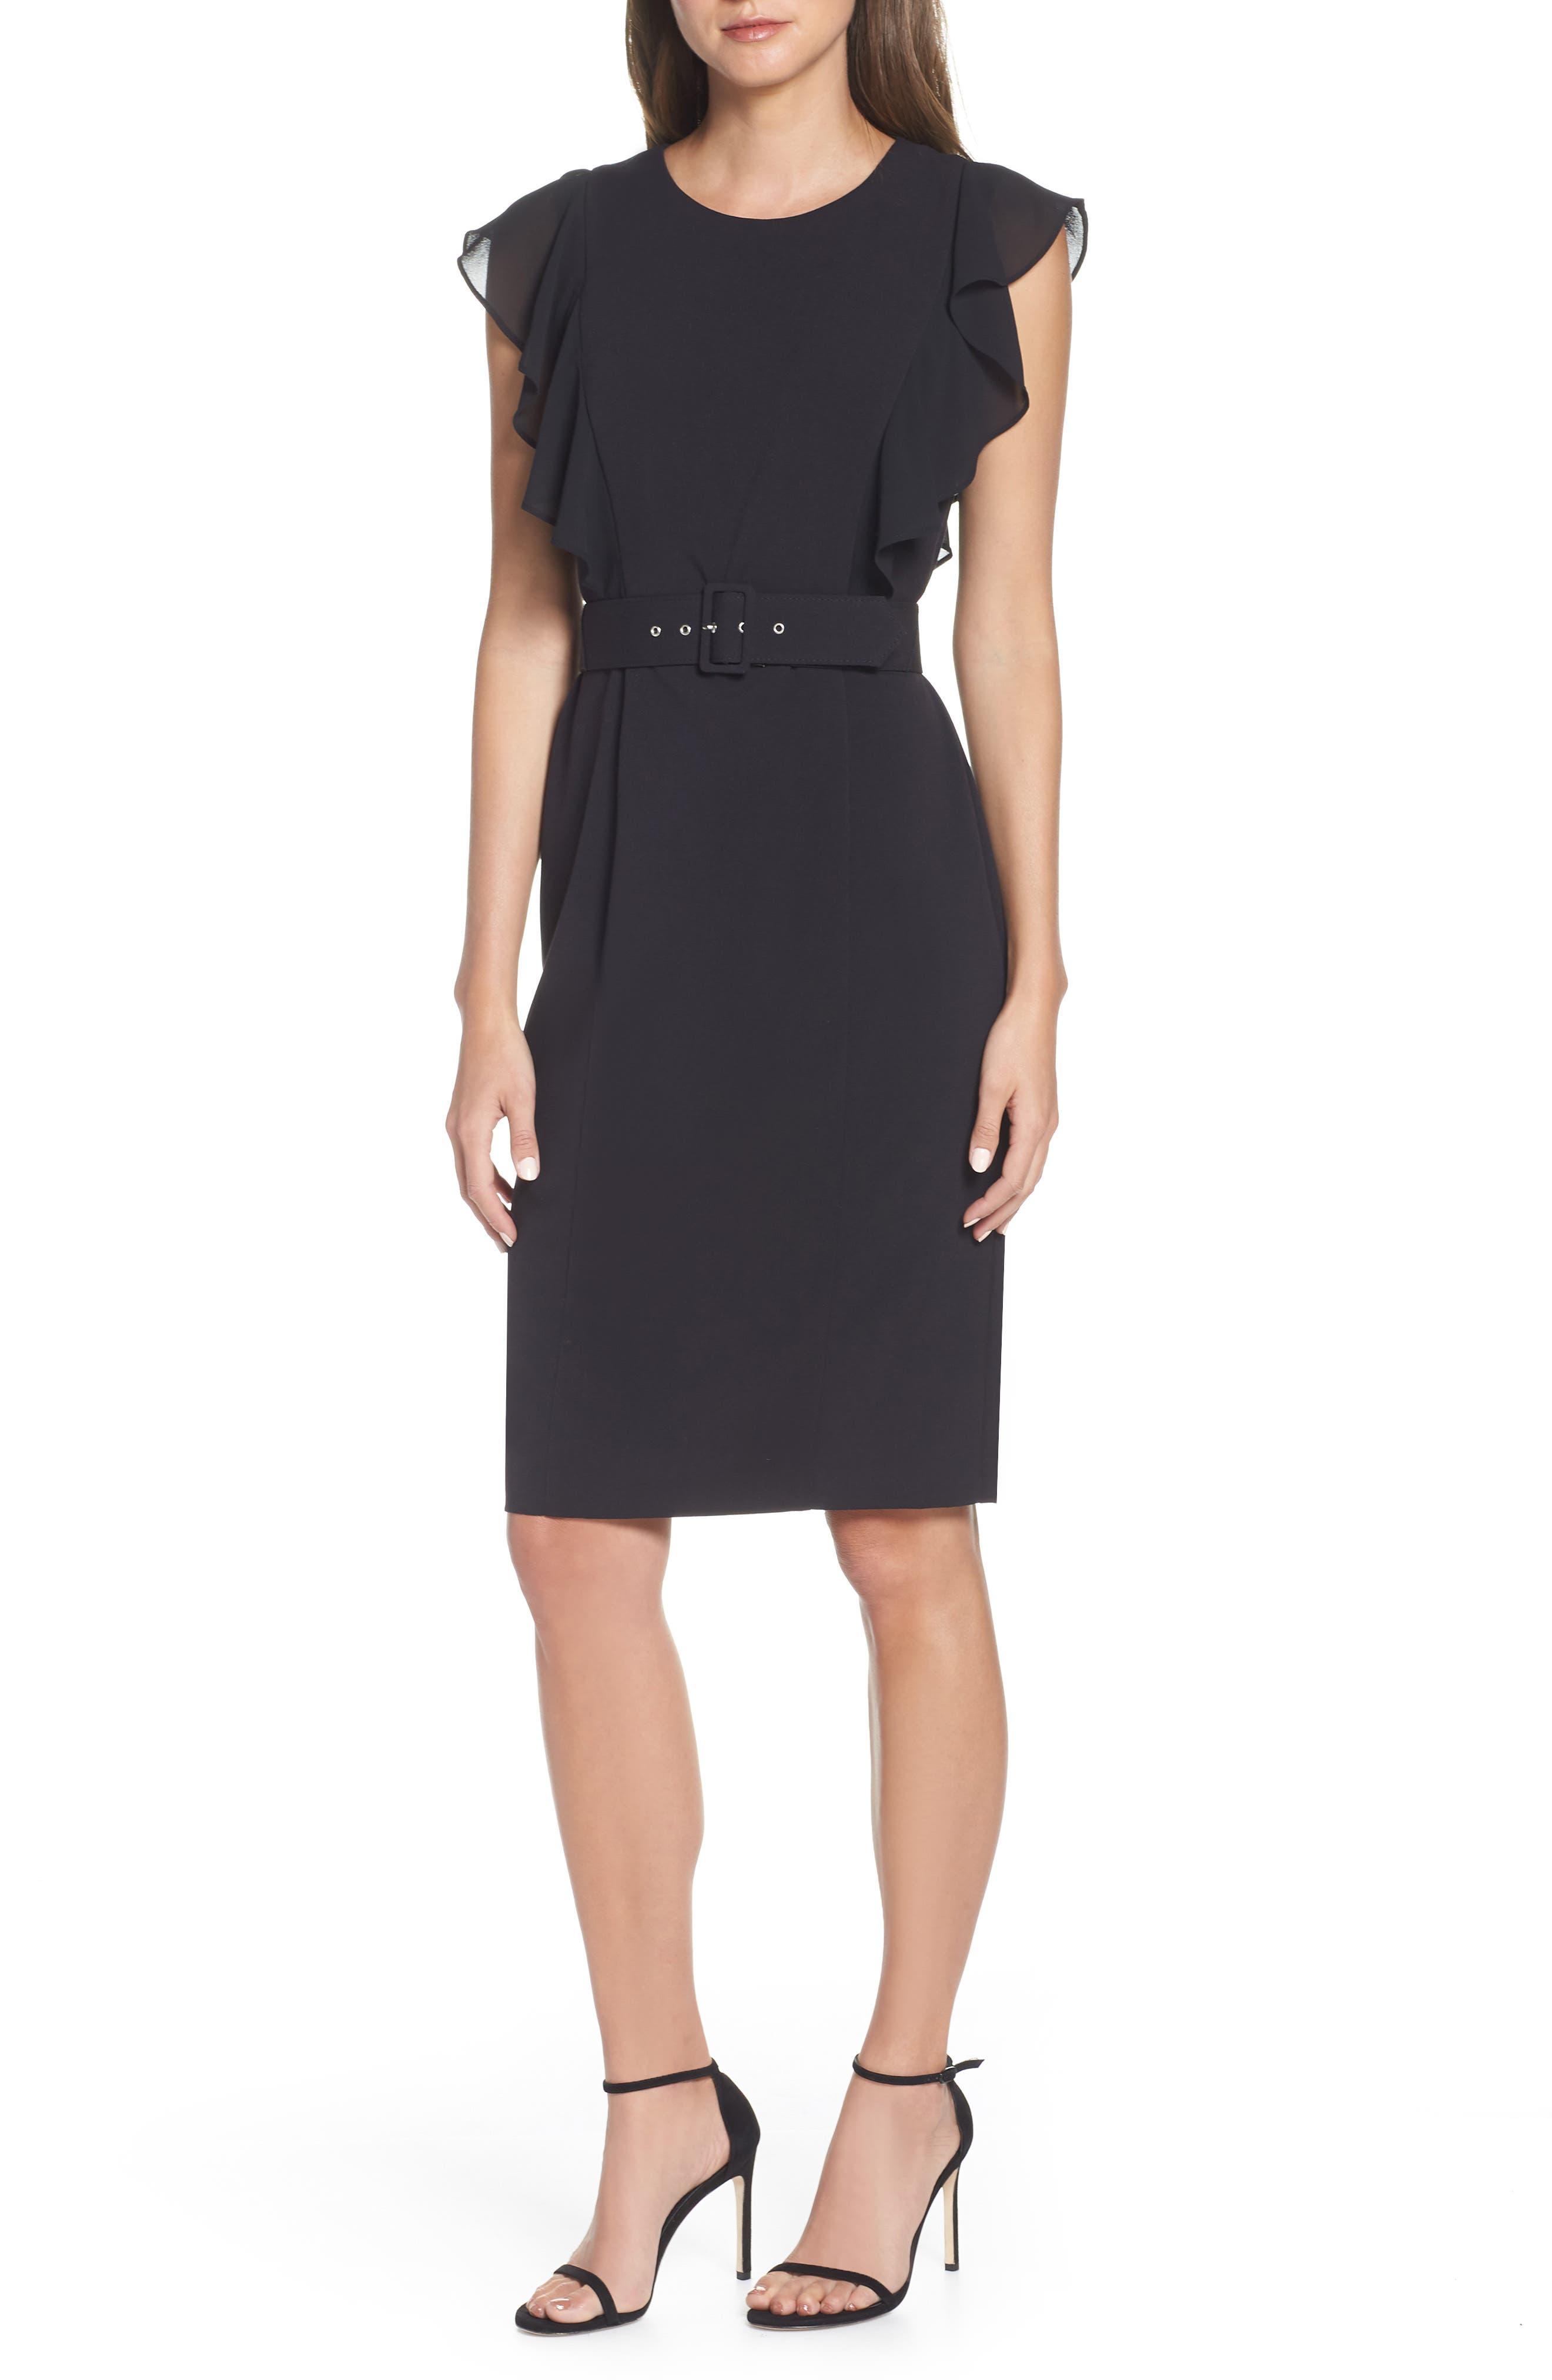 HARPER ROSE, Belted Sheath Dress, Main thumbnail 1, color, 001